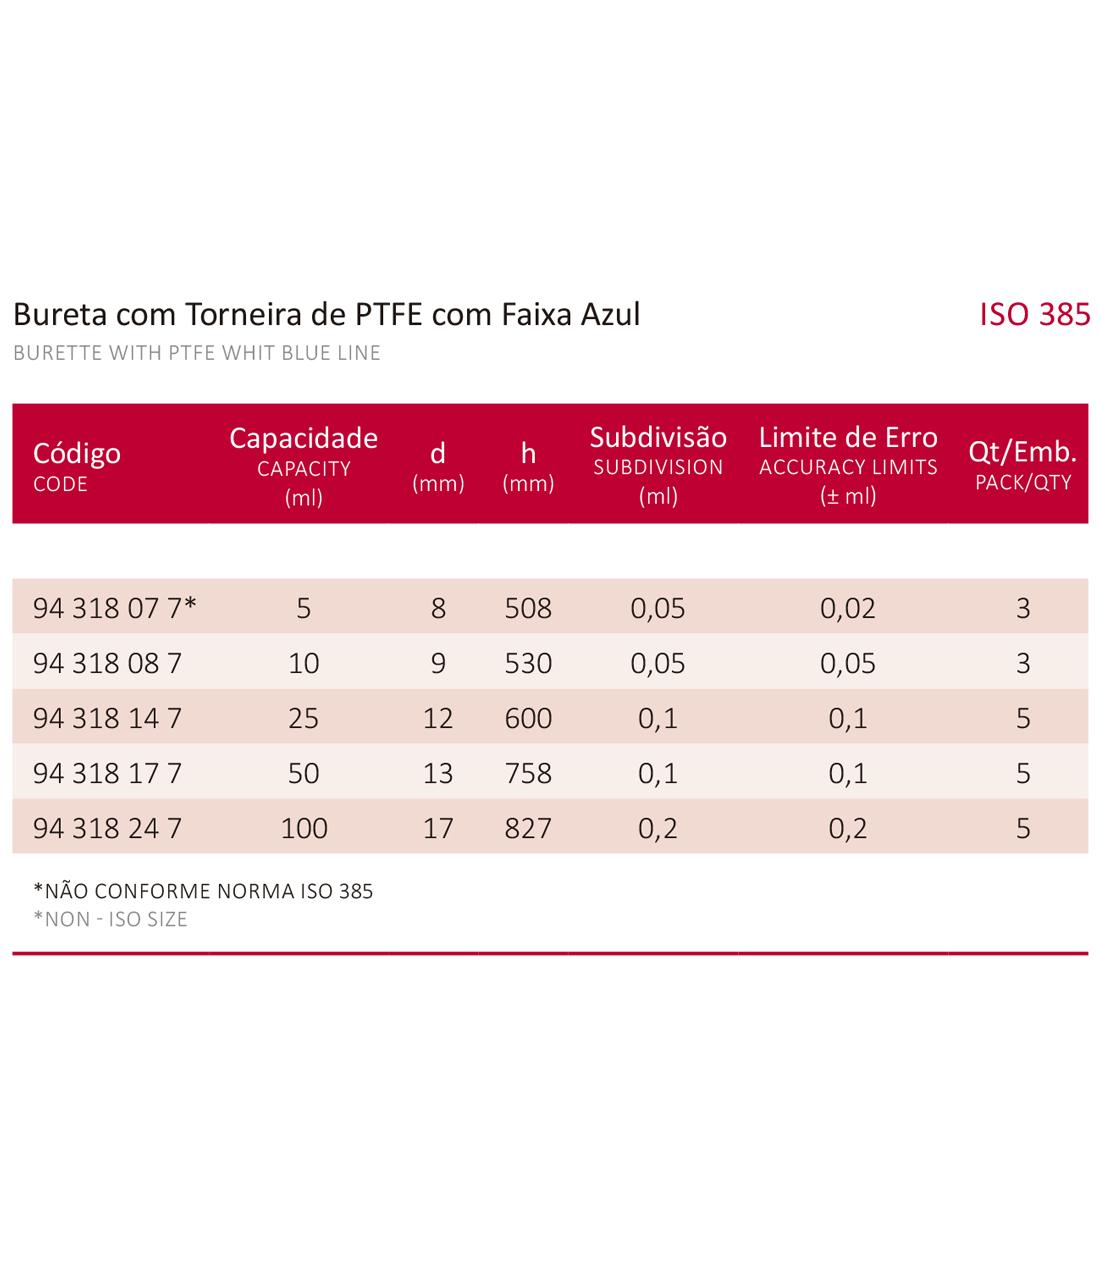 BURETA C/TORN. PTFE F/AZUL 25 ML - Laborglas - Cód. 94318147